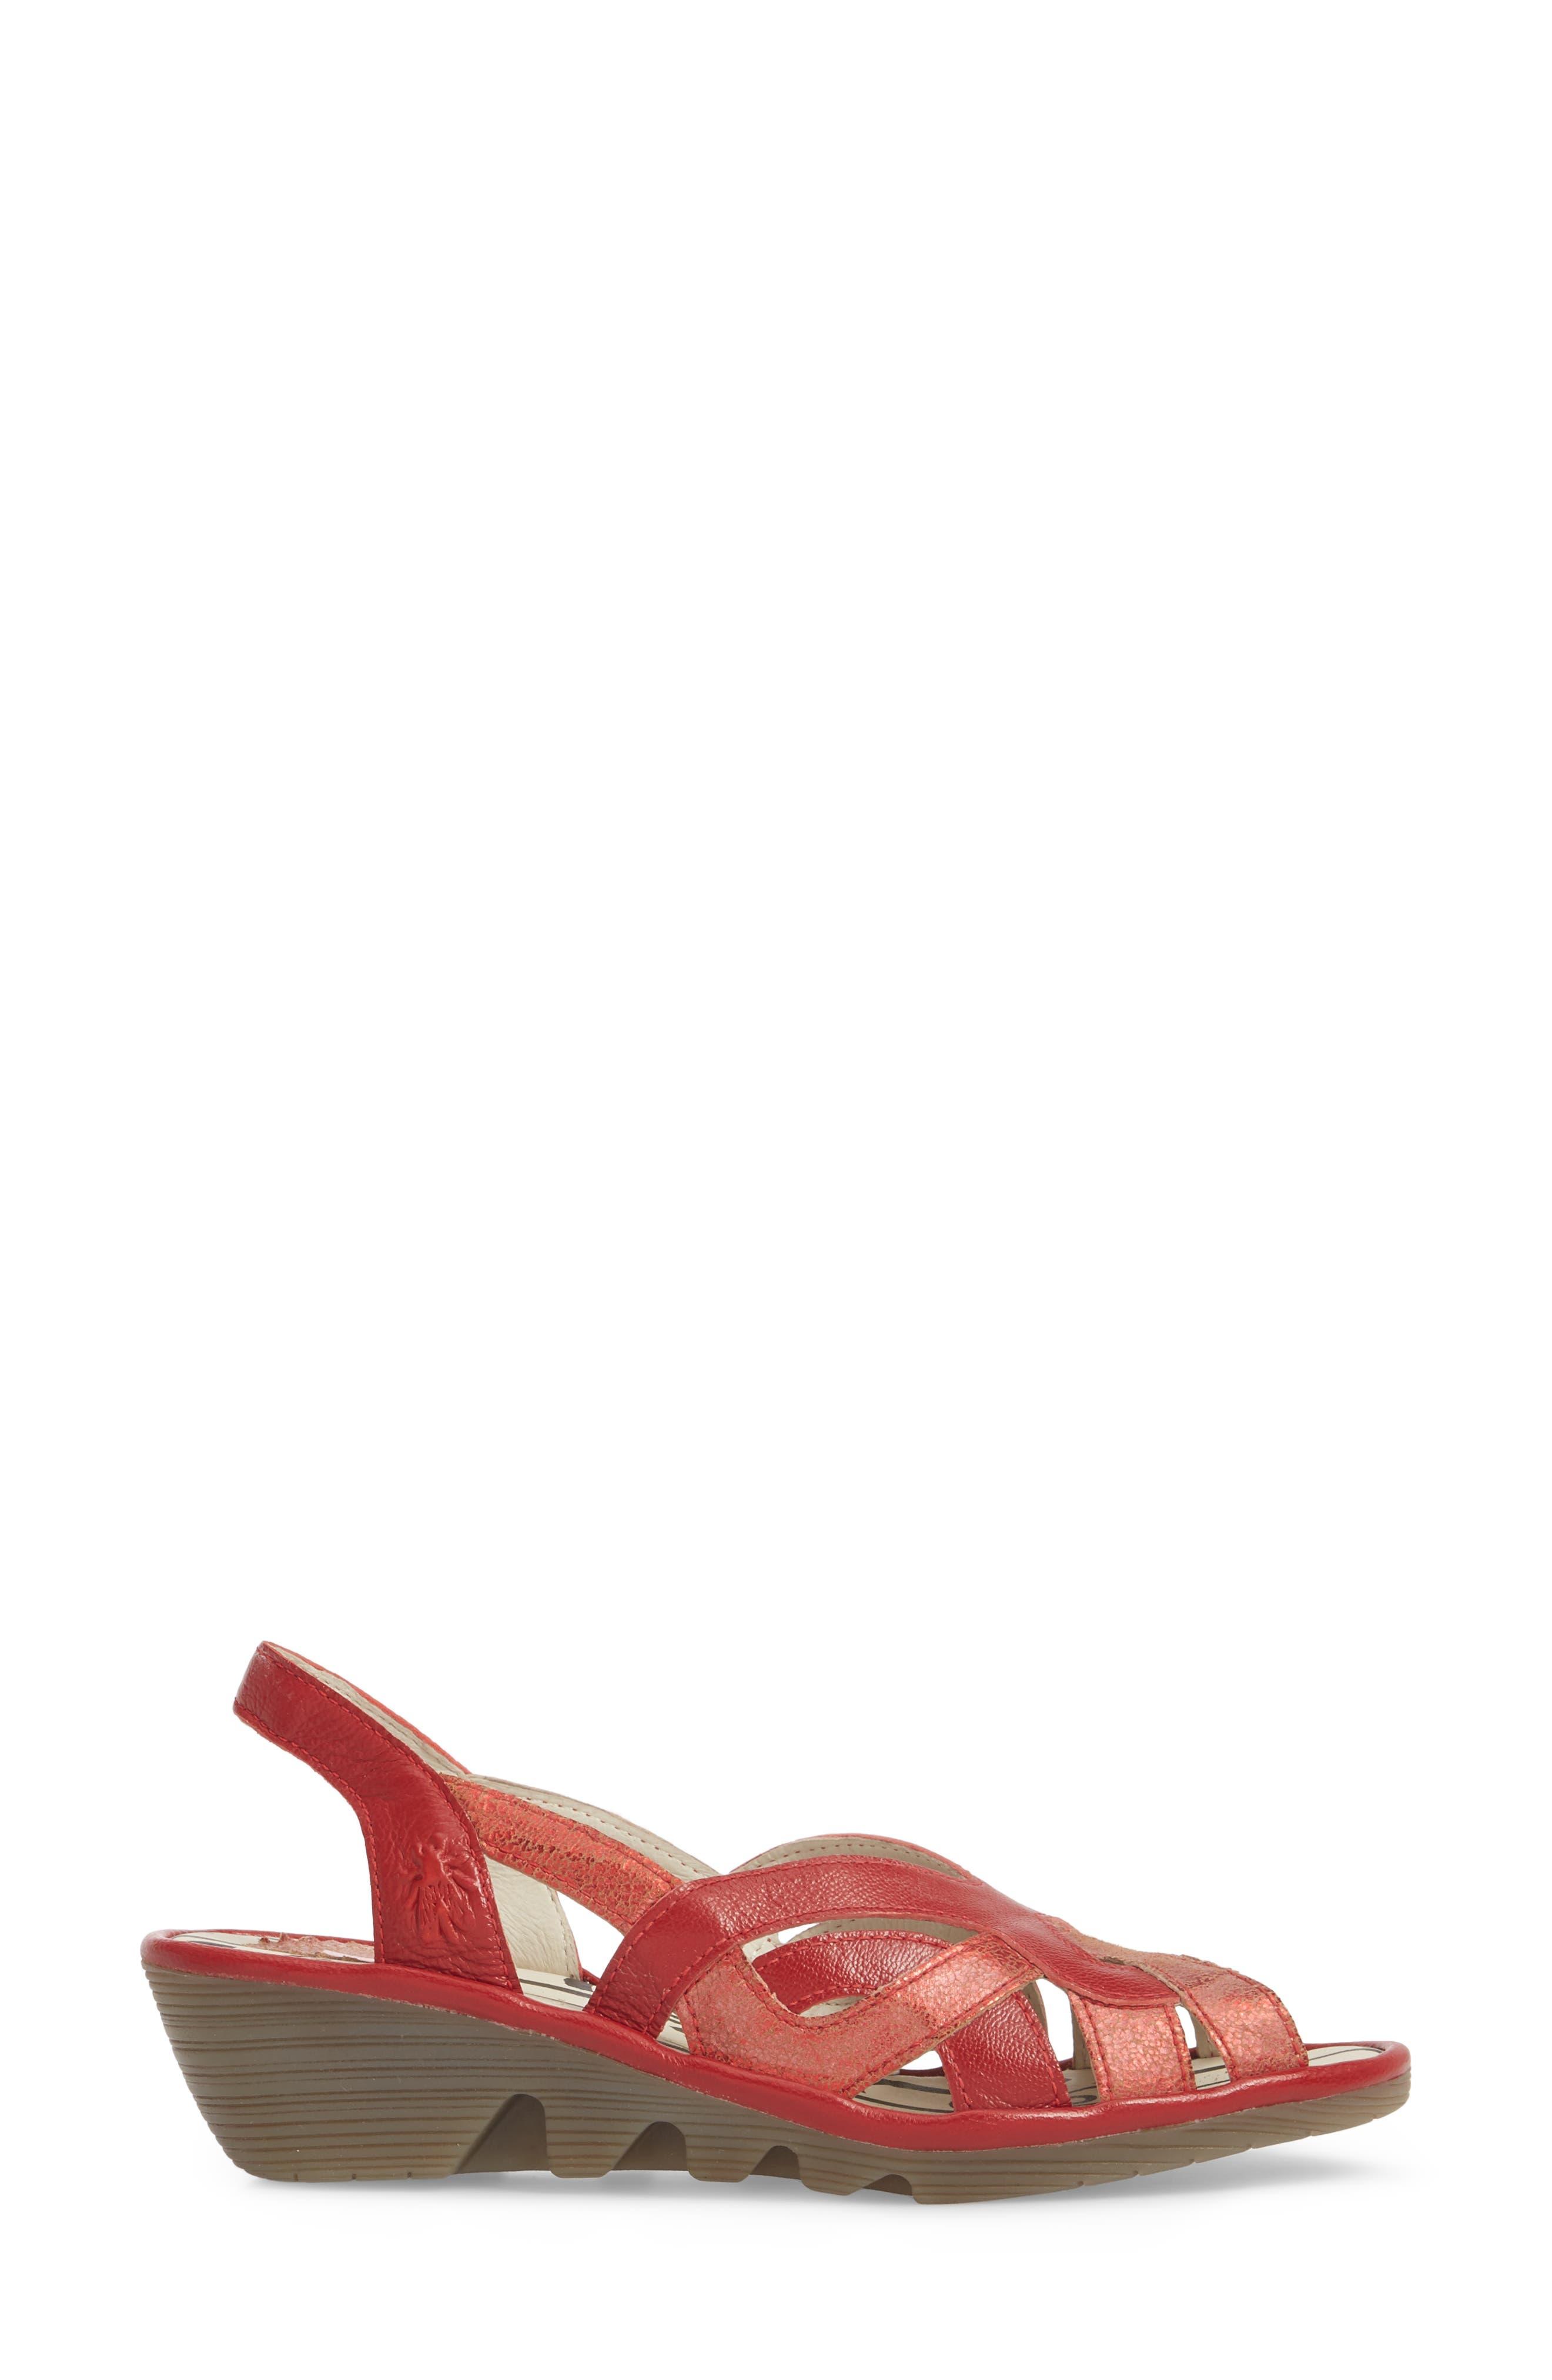 Pima Sandal,                             Alternate thumbnail 3, color,                             Red Mix Leather